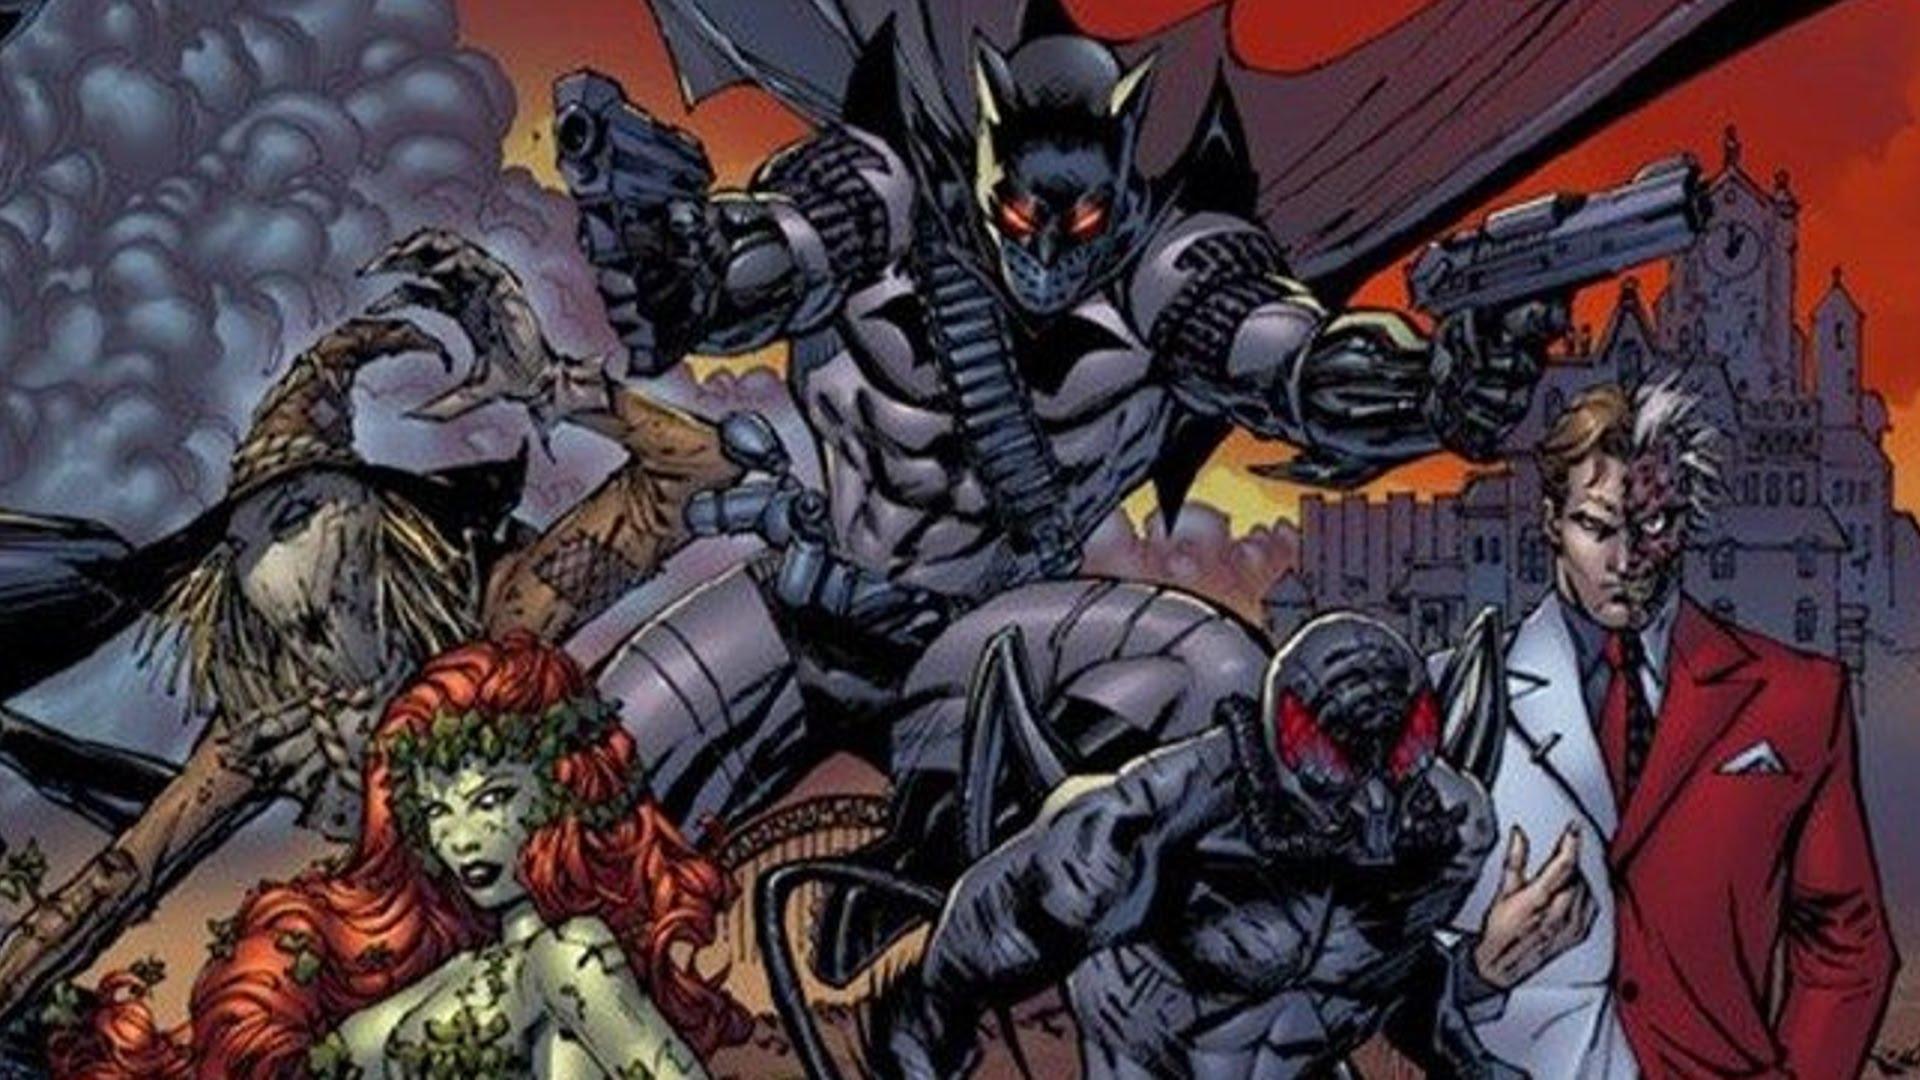 HD Quality Wallpaper | Collection: Comics, 1920x1080 Batman: Battle For The Cowl